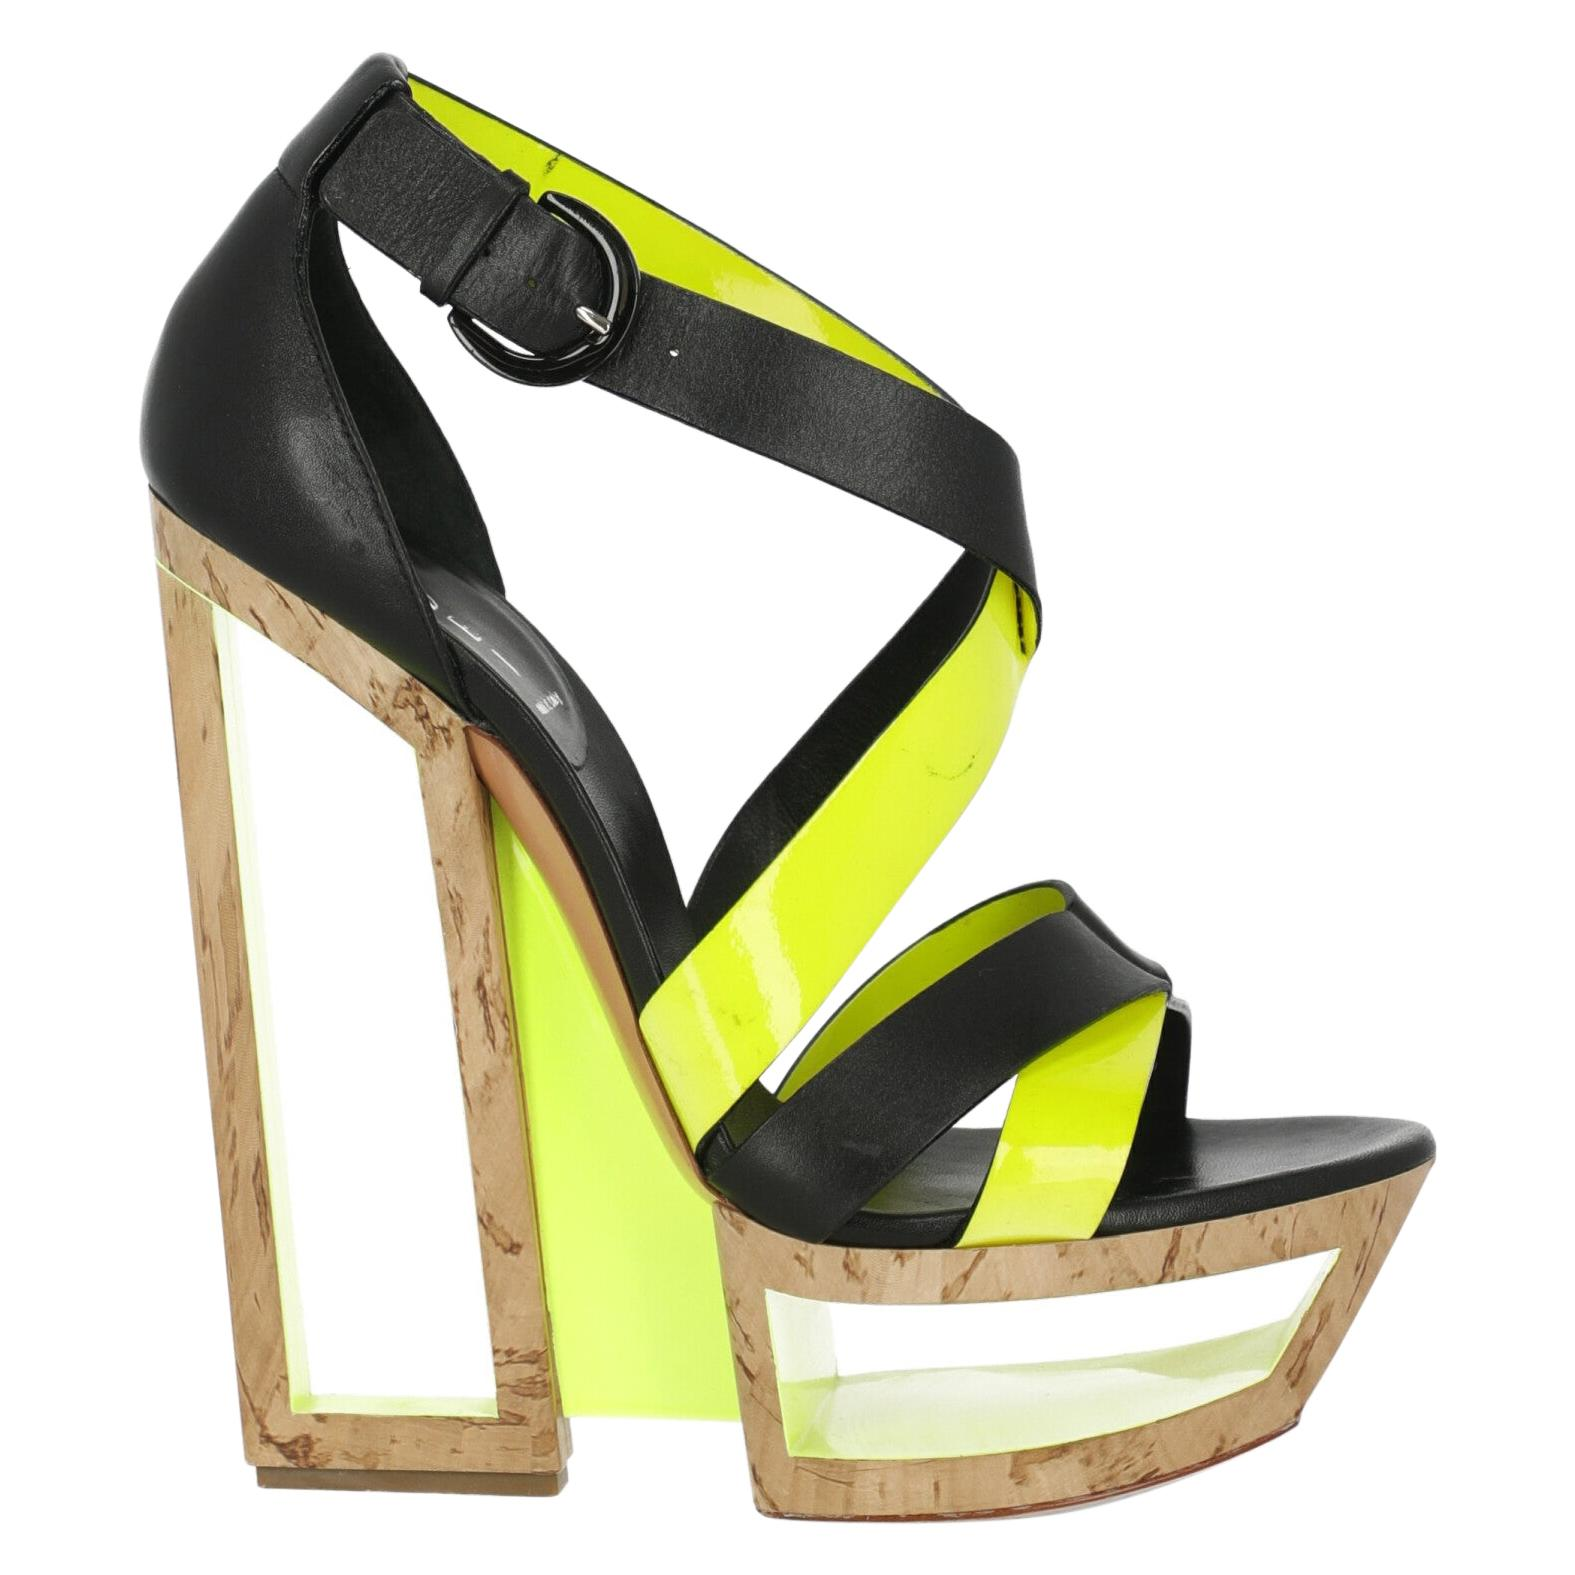 Casadei Woman Sandals Black Leather US 8